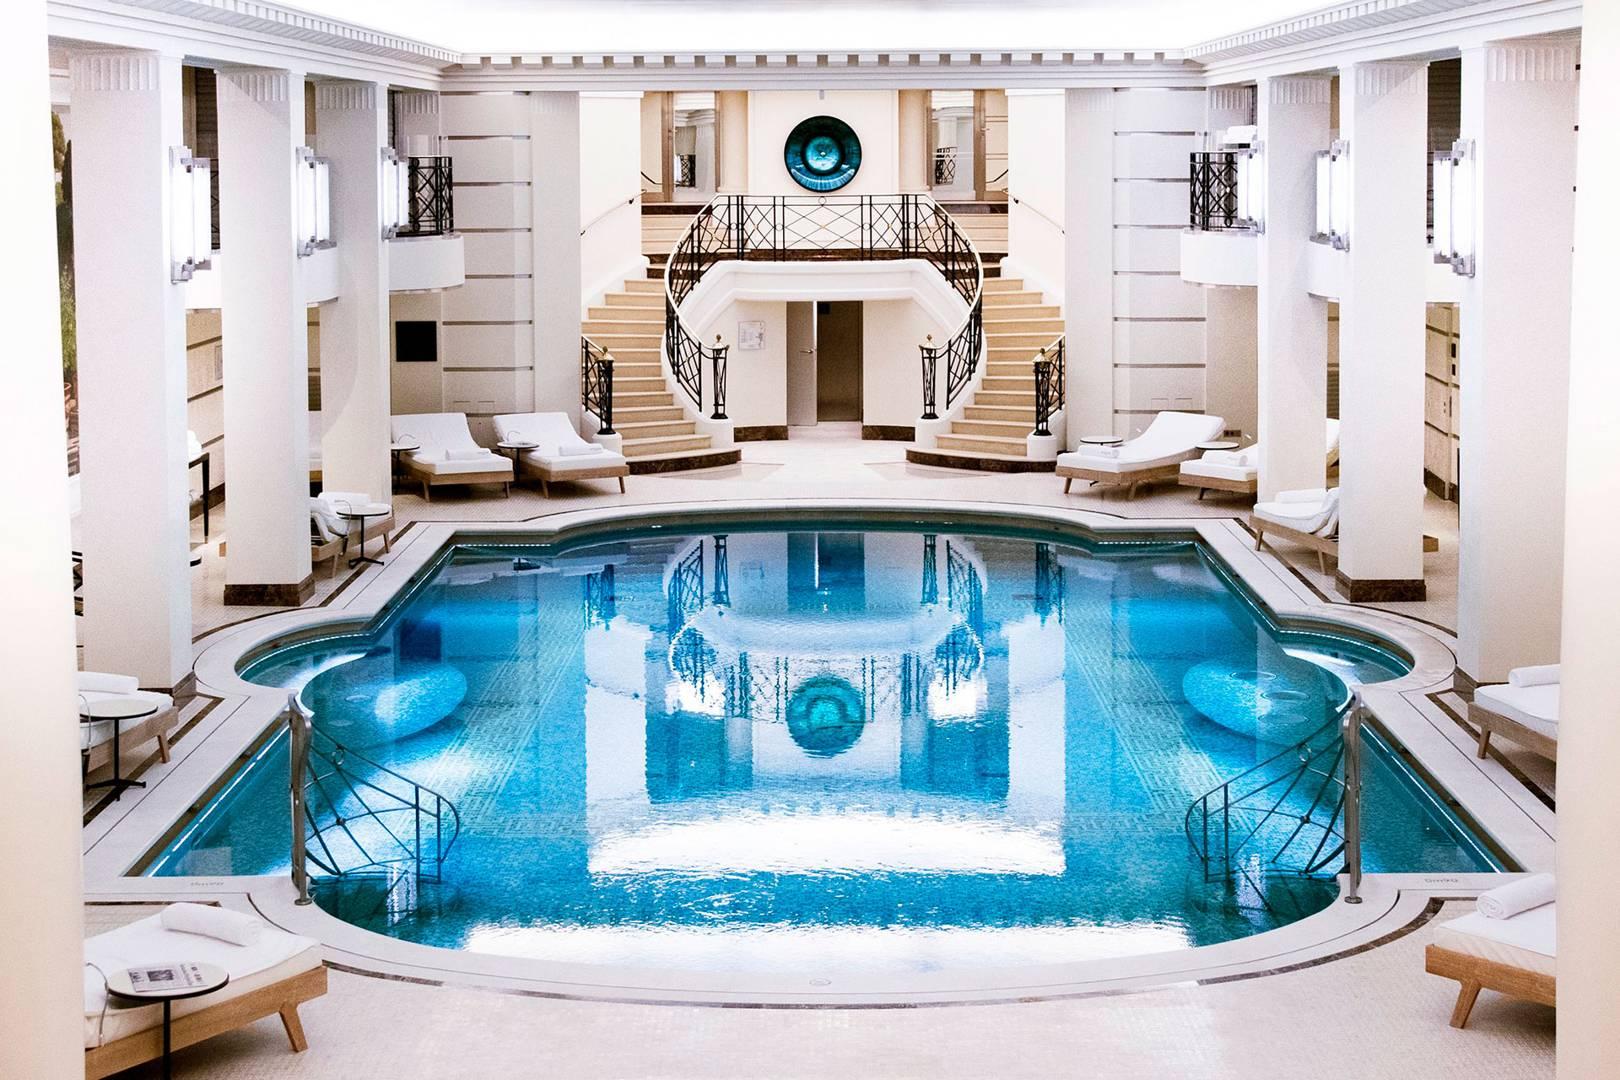 Best Paris Spas Vogue Spa Guide British Vogue